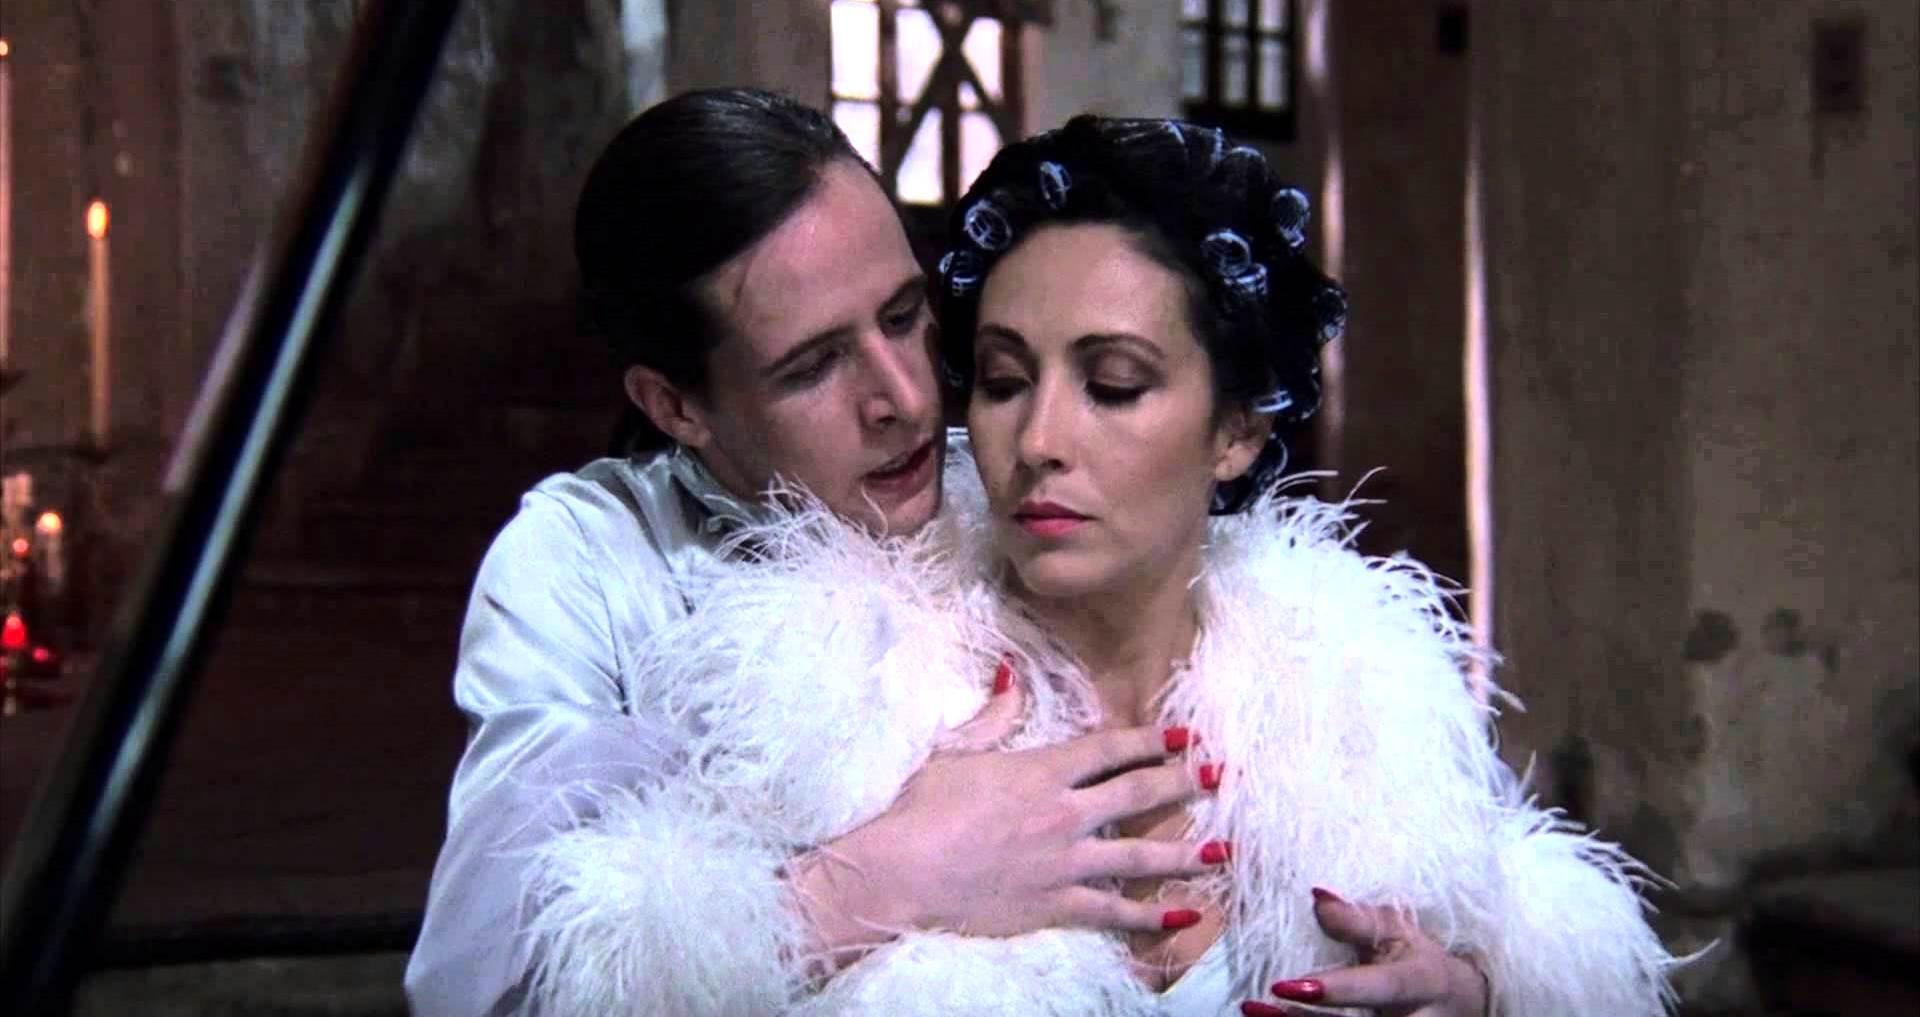 Mother and son mime act - Fenix (Axel Jodorowsky) and Concha (Blanca Guerra) in Santa Sangre (1989)